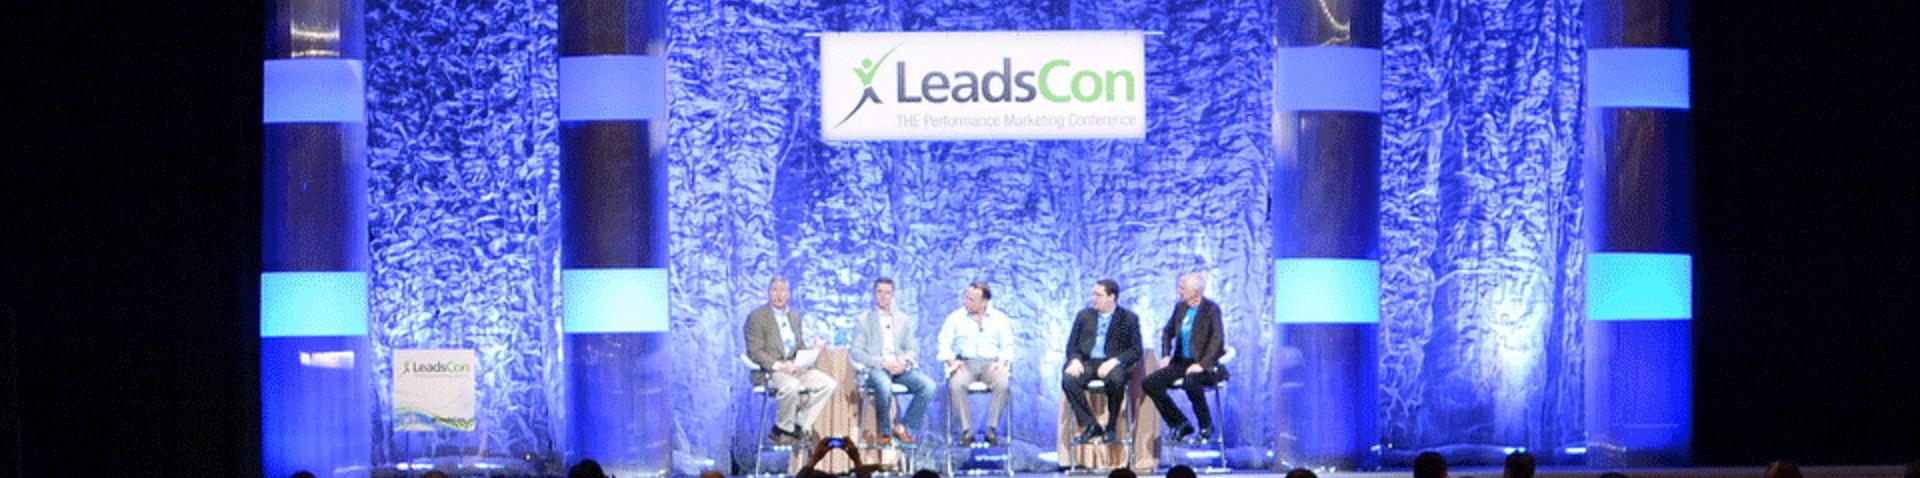 LeadsCon New York